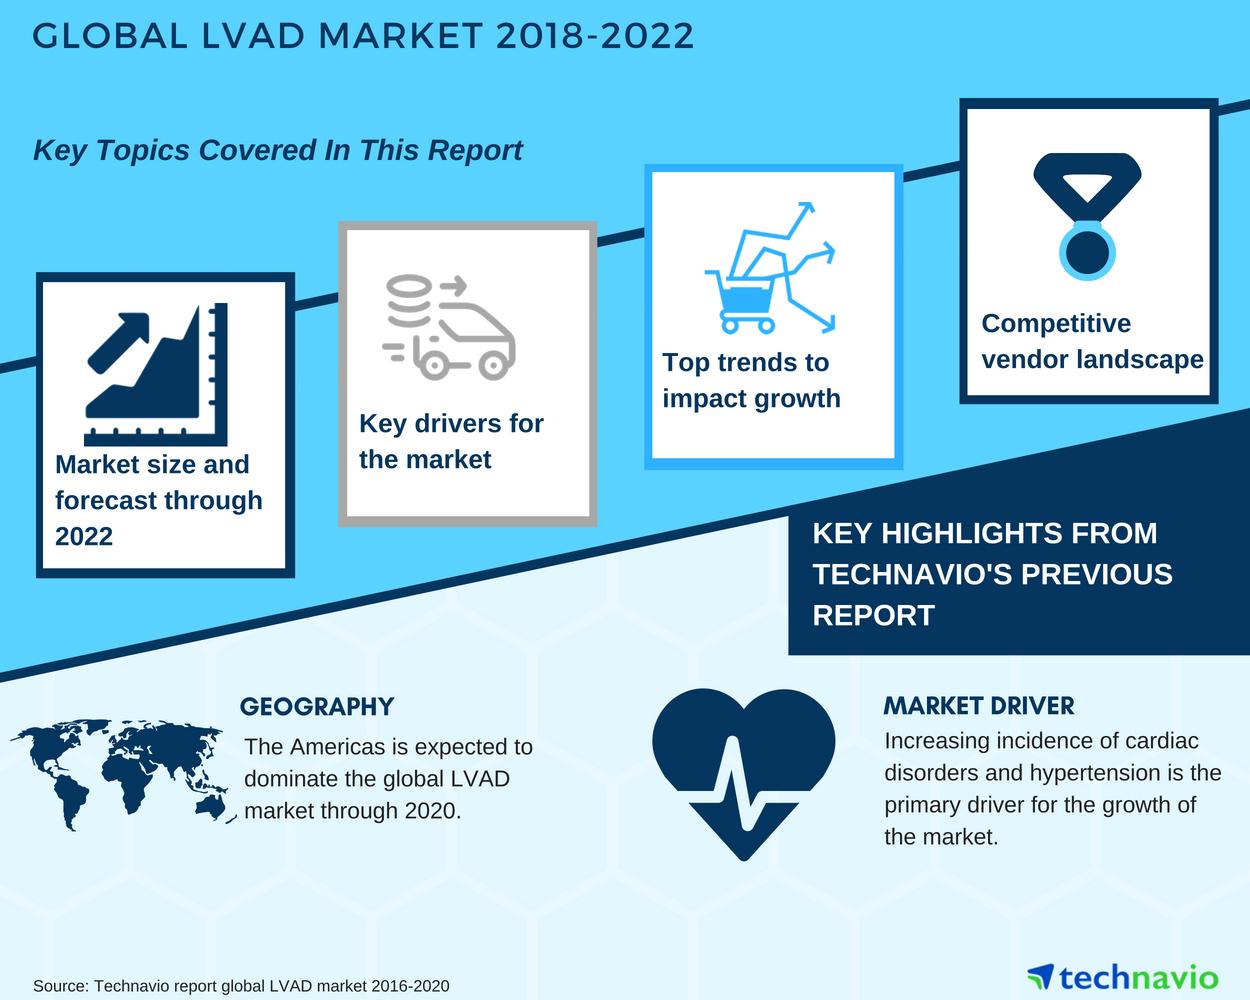 Global LVAD Market - Increasing Incidence of Cardiac Disorders to ...